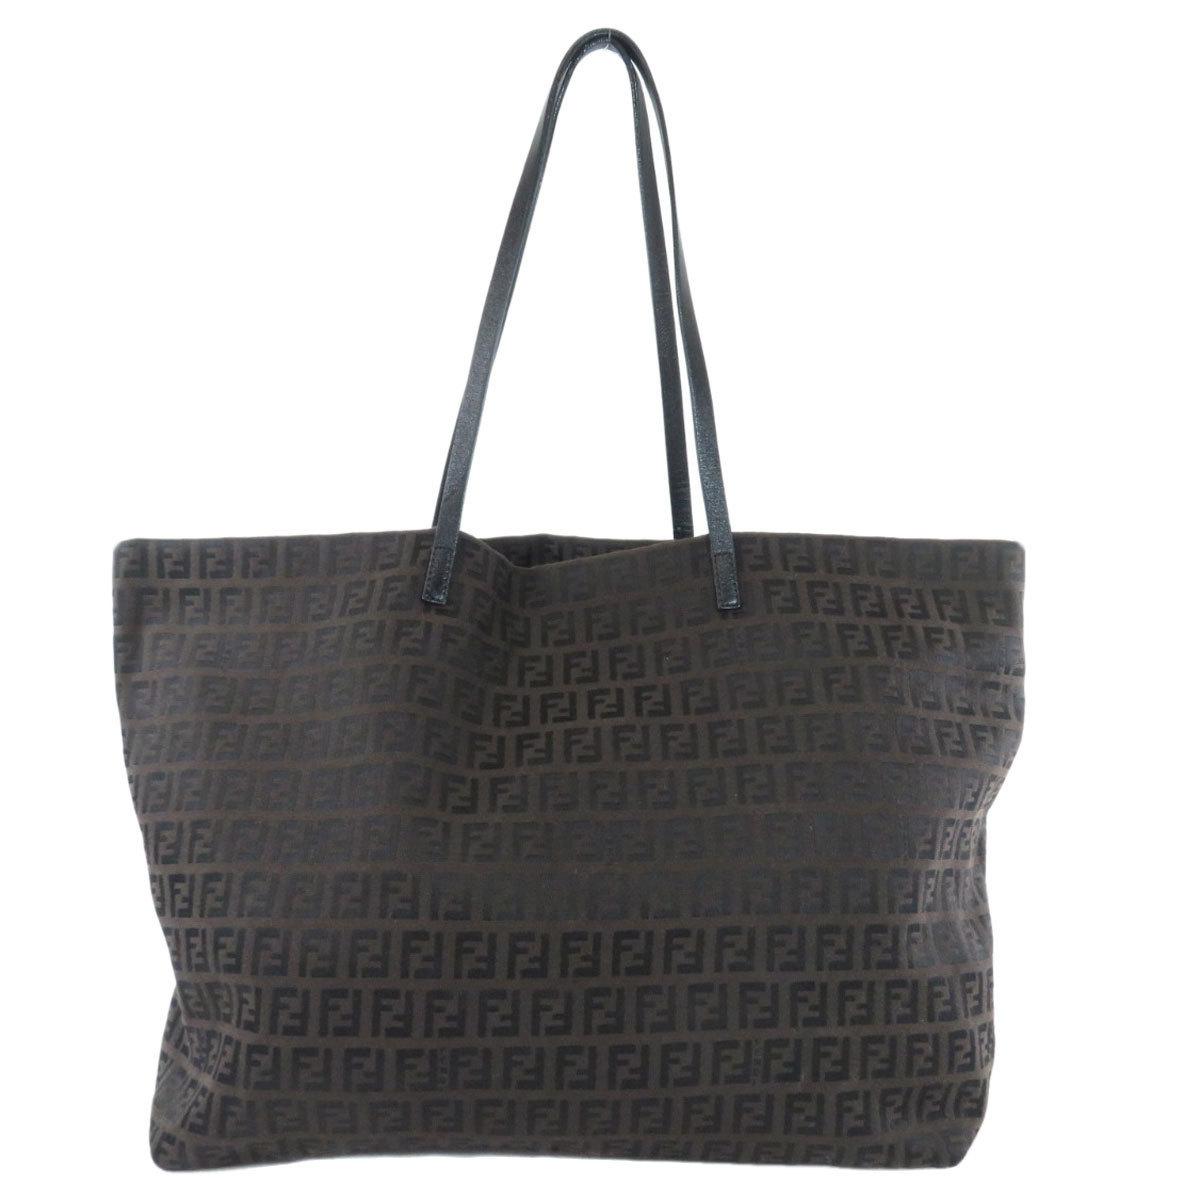 Fendi Zucchino Tote Bag Canvas Leather Ladies